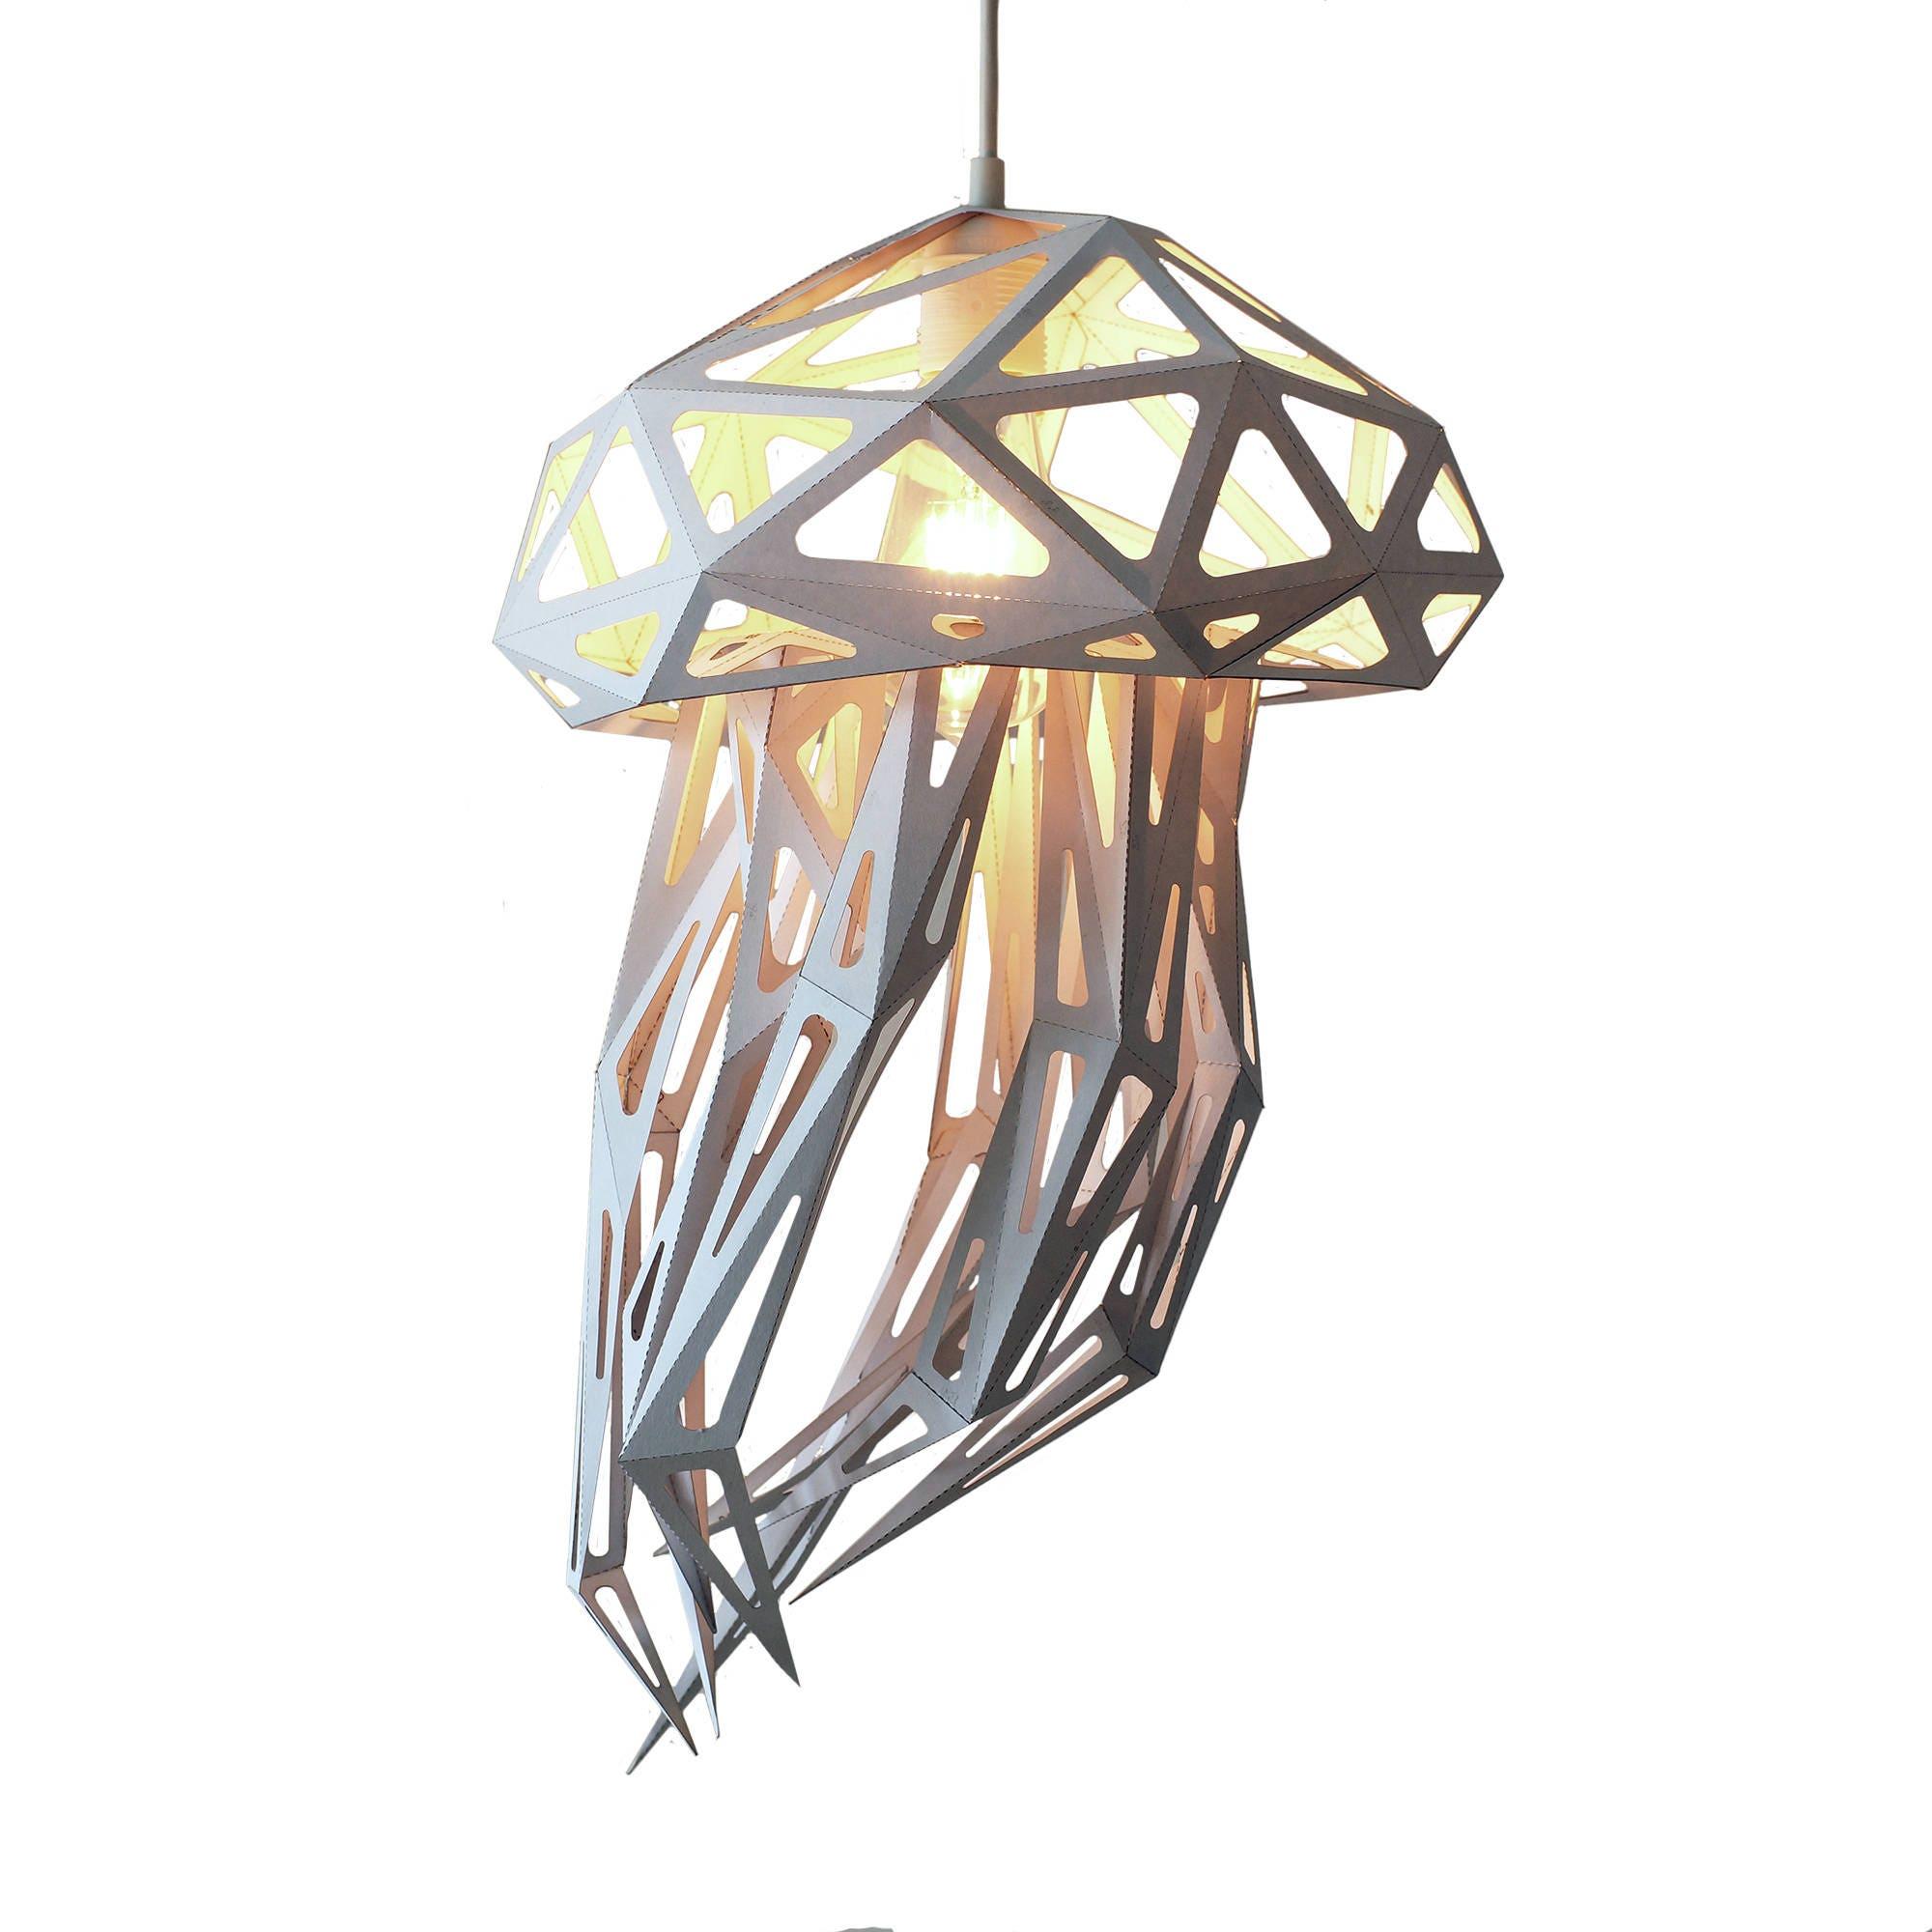 Jellyfish Geometric Lamp Polygonal animals Bedside Lamp for Diy Geometric Lamp  585hul